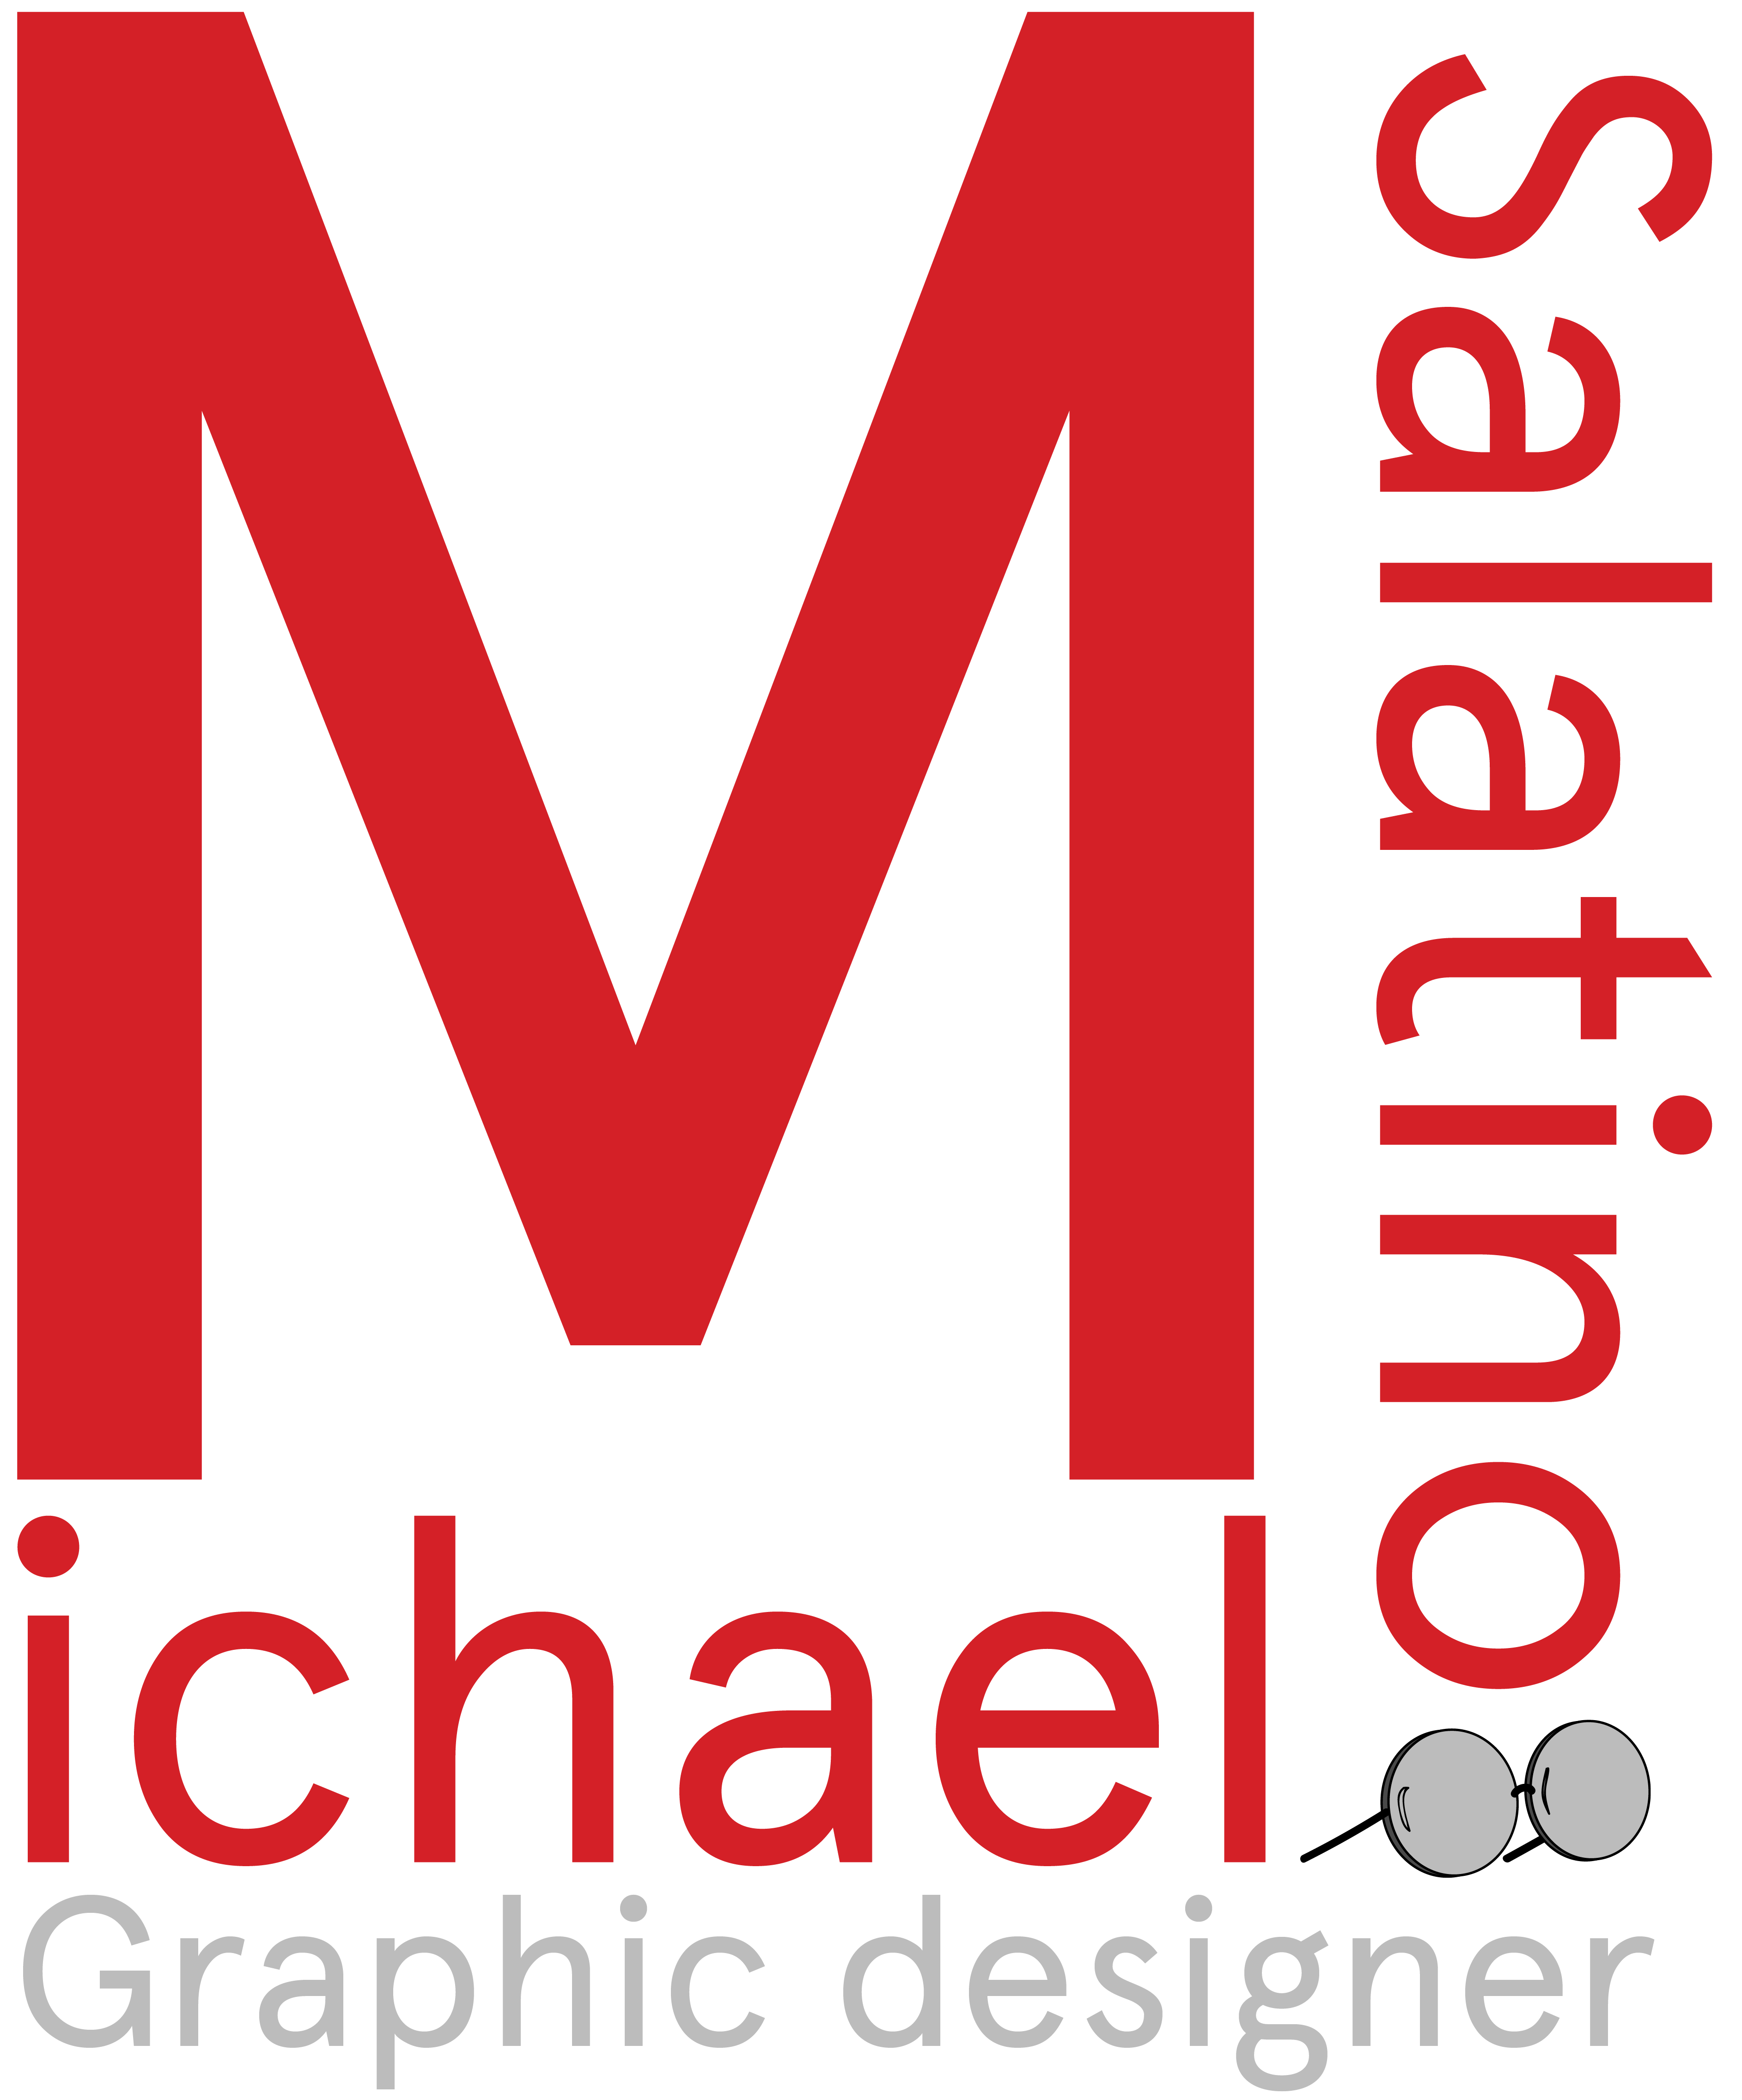 Michael Salatino